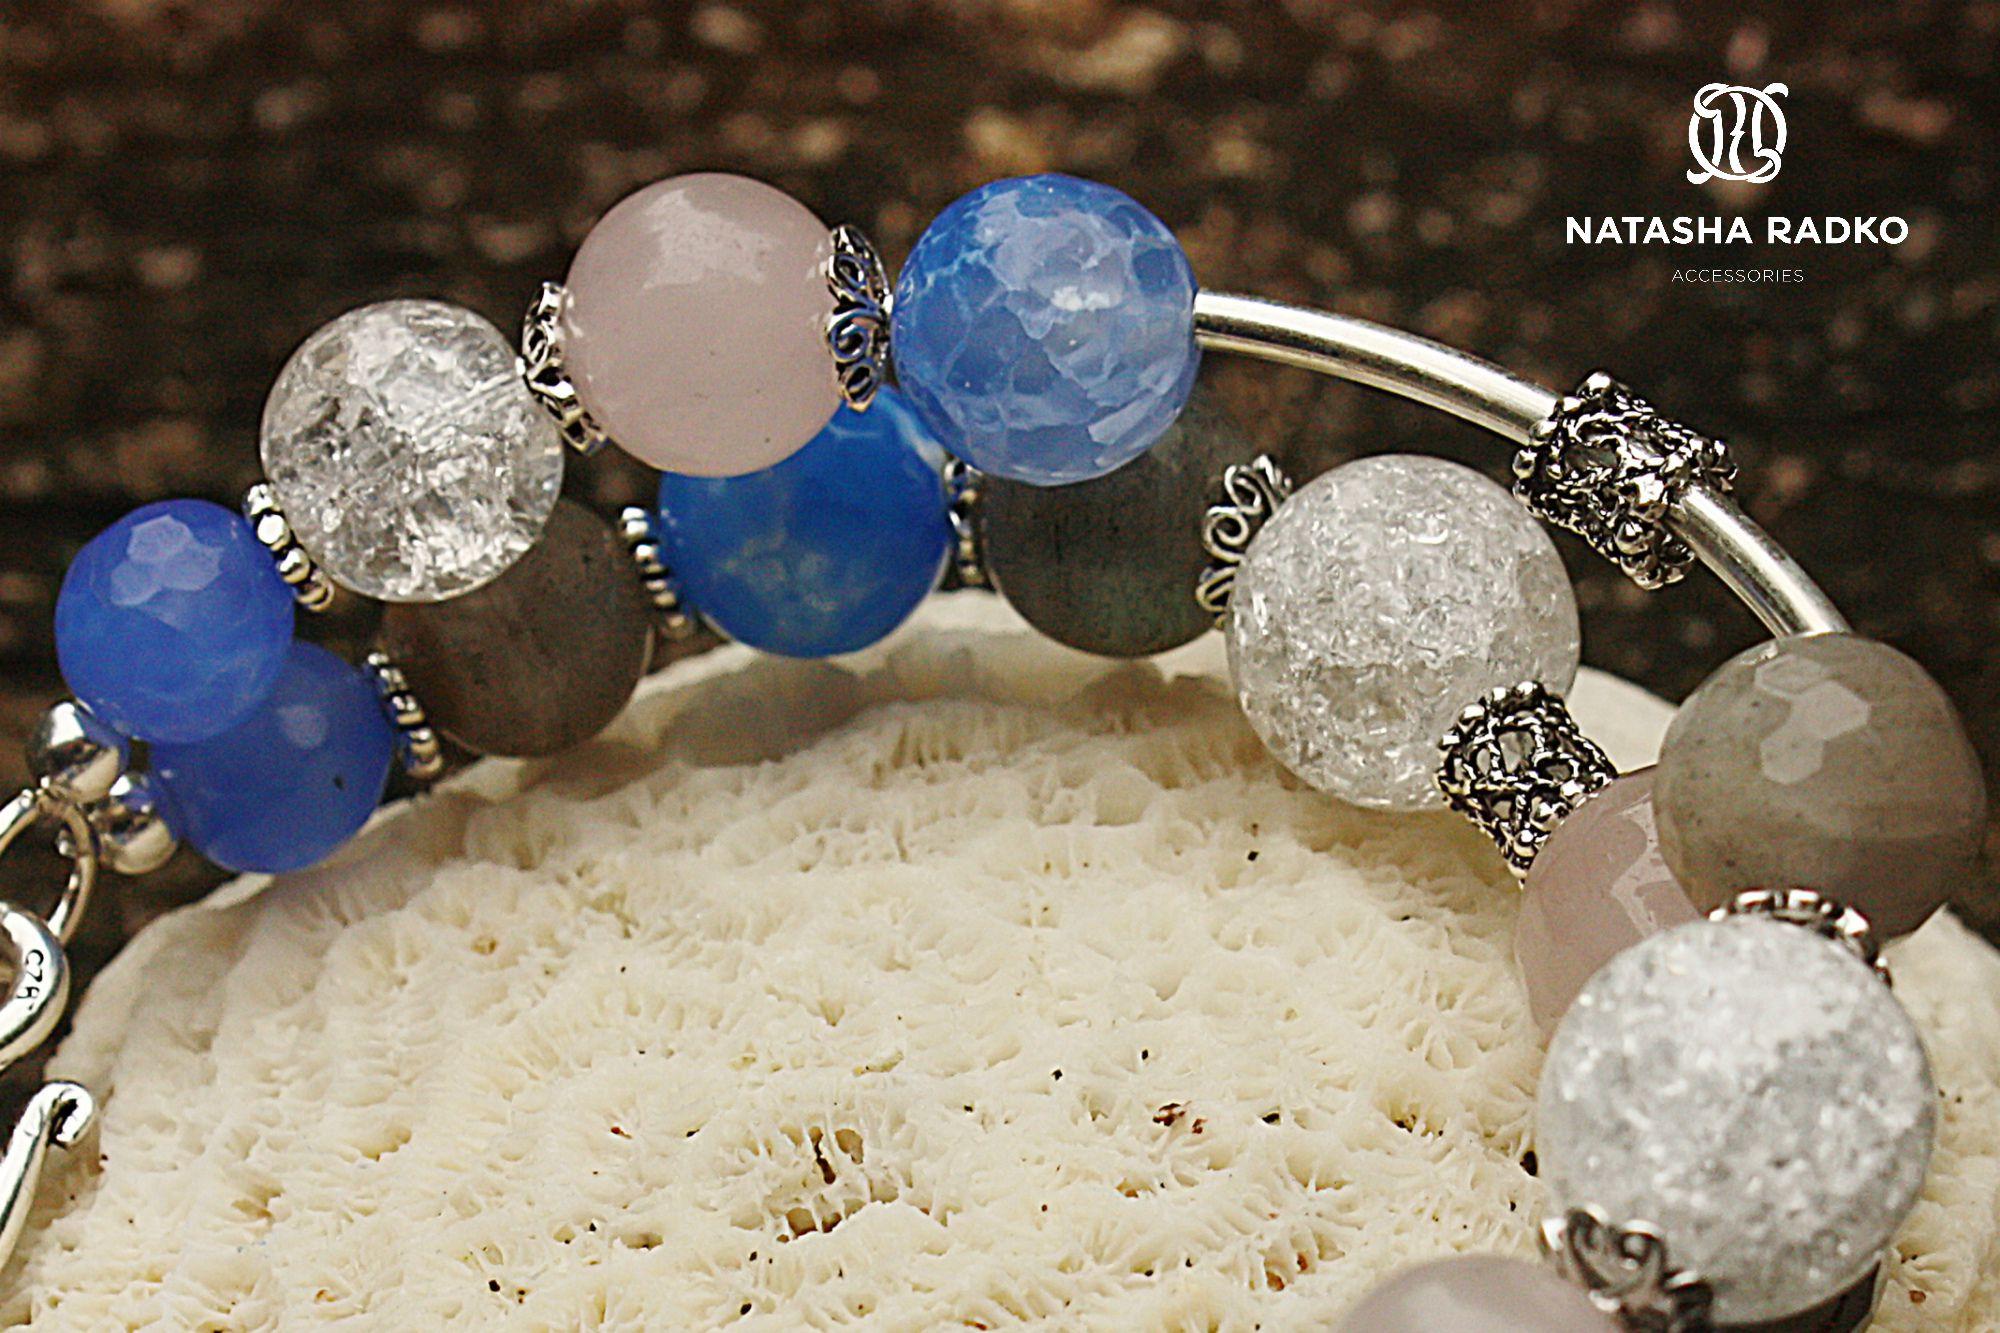 agate quartz jewelry labradorite wristlet